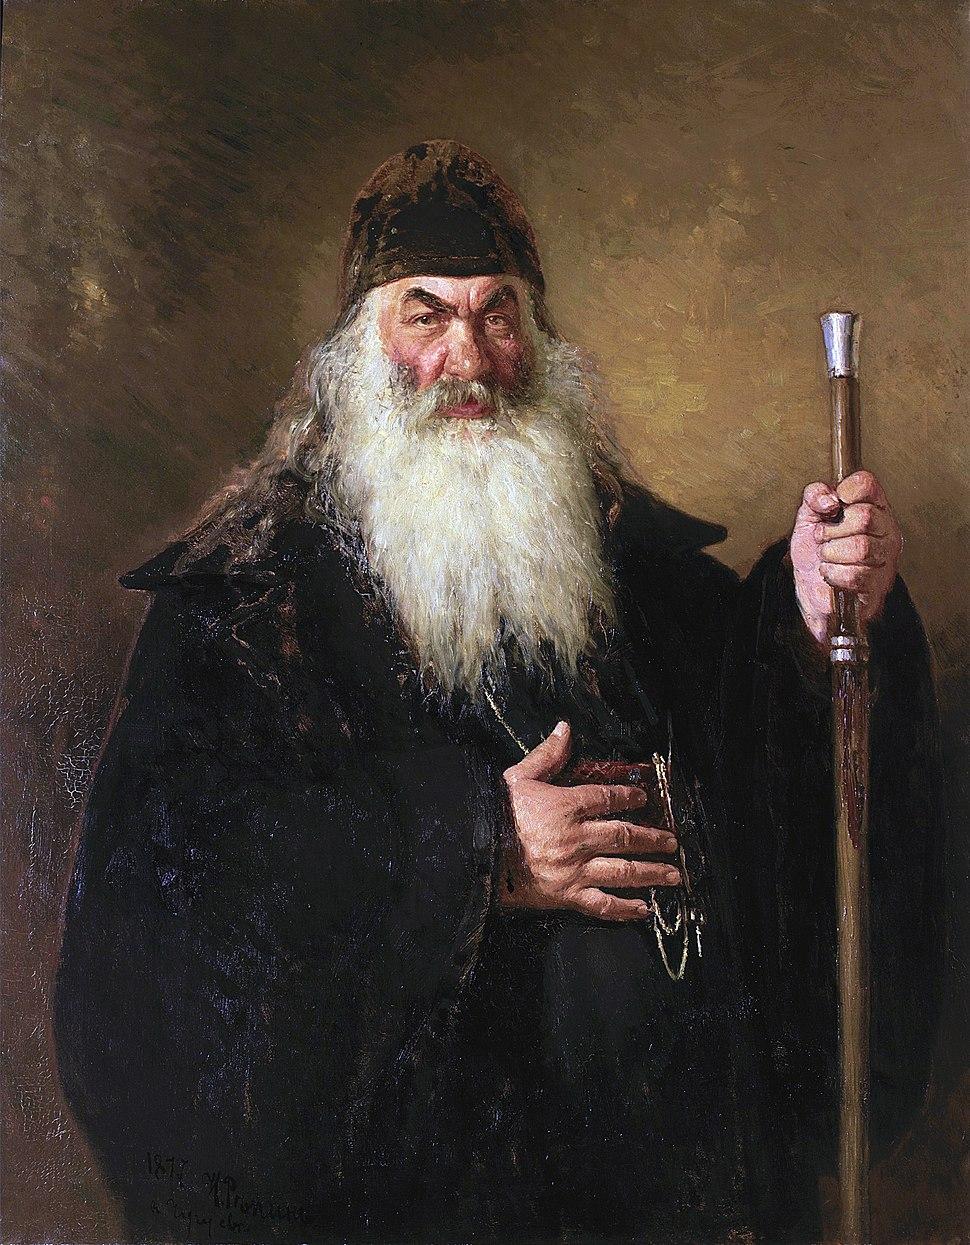 Archdeacon by Repin